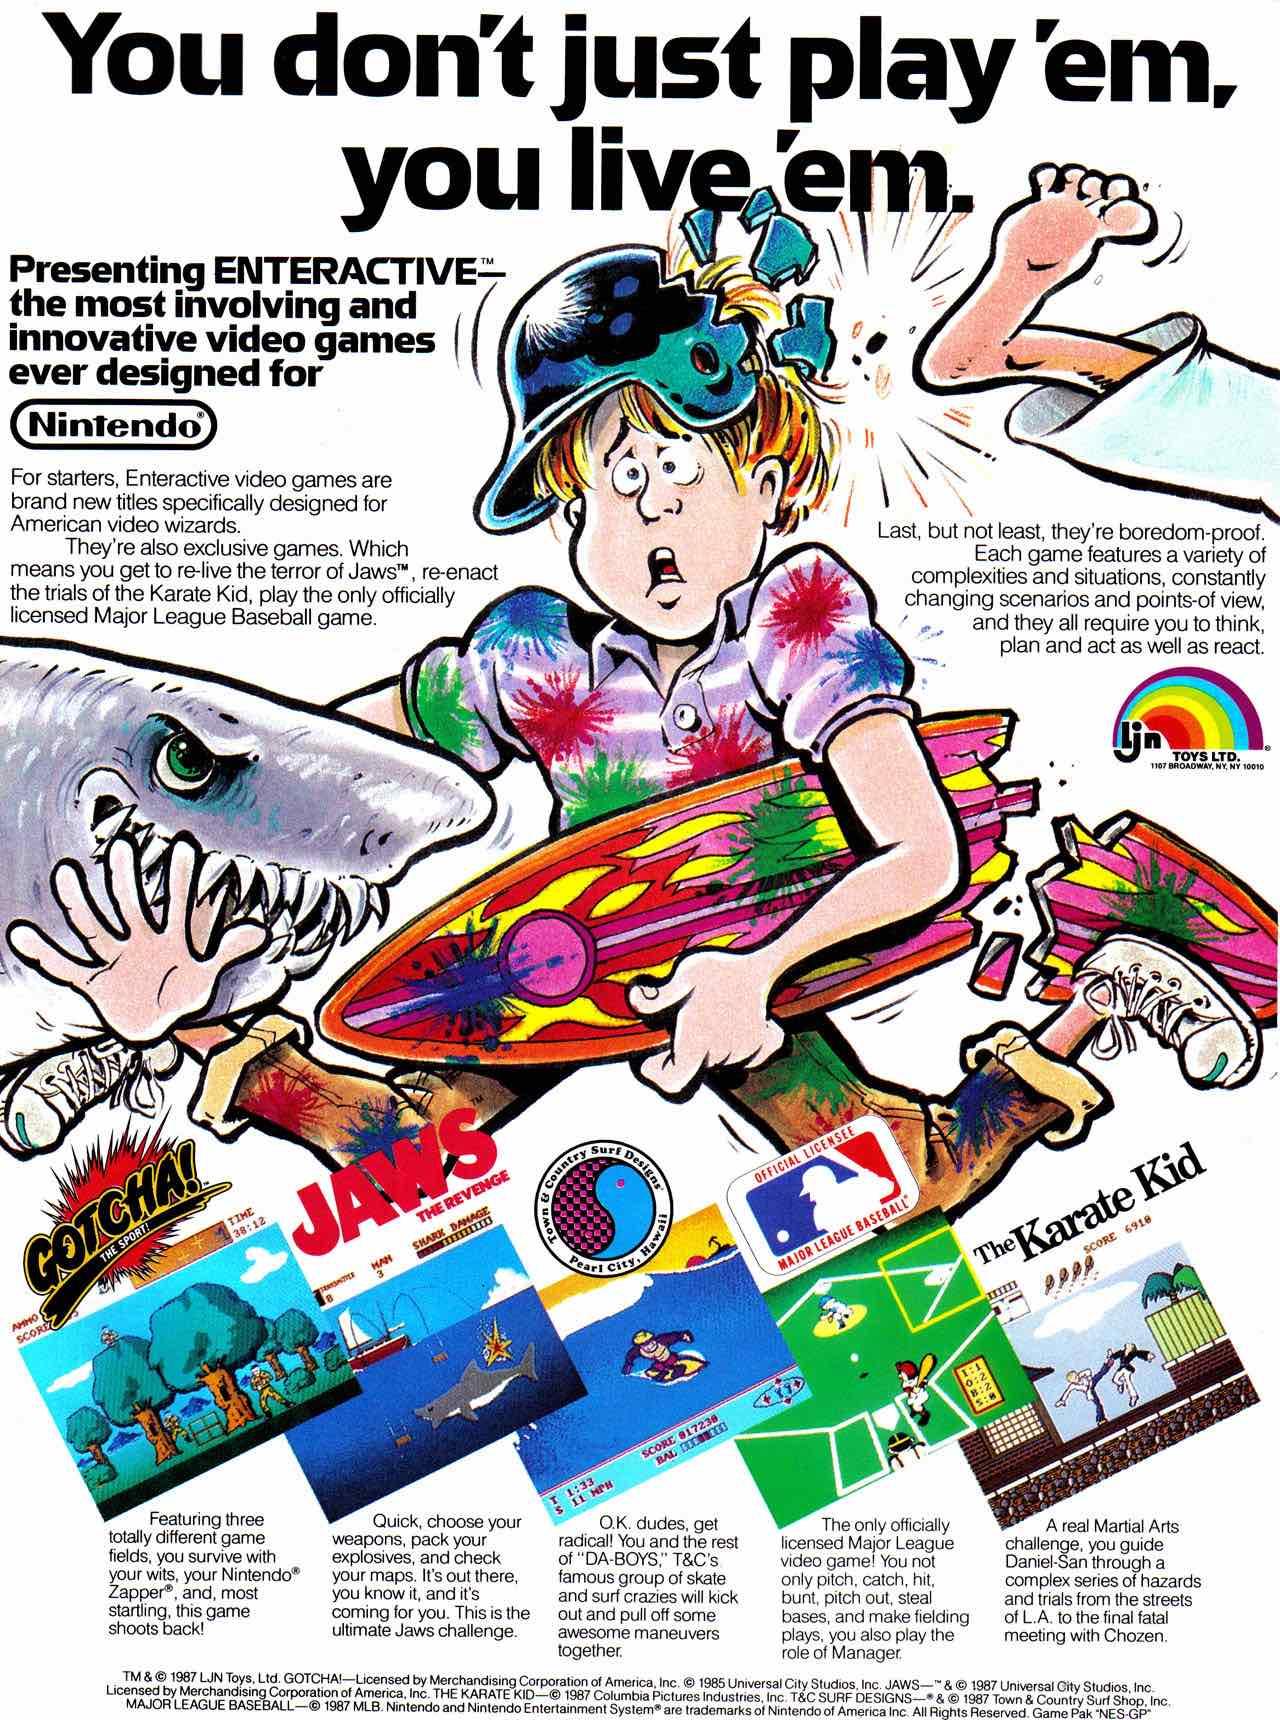 NIntendo Fun Club News | Winter 1987 - 15